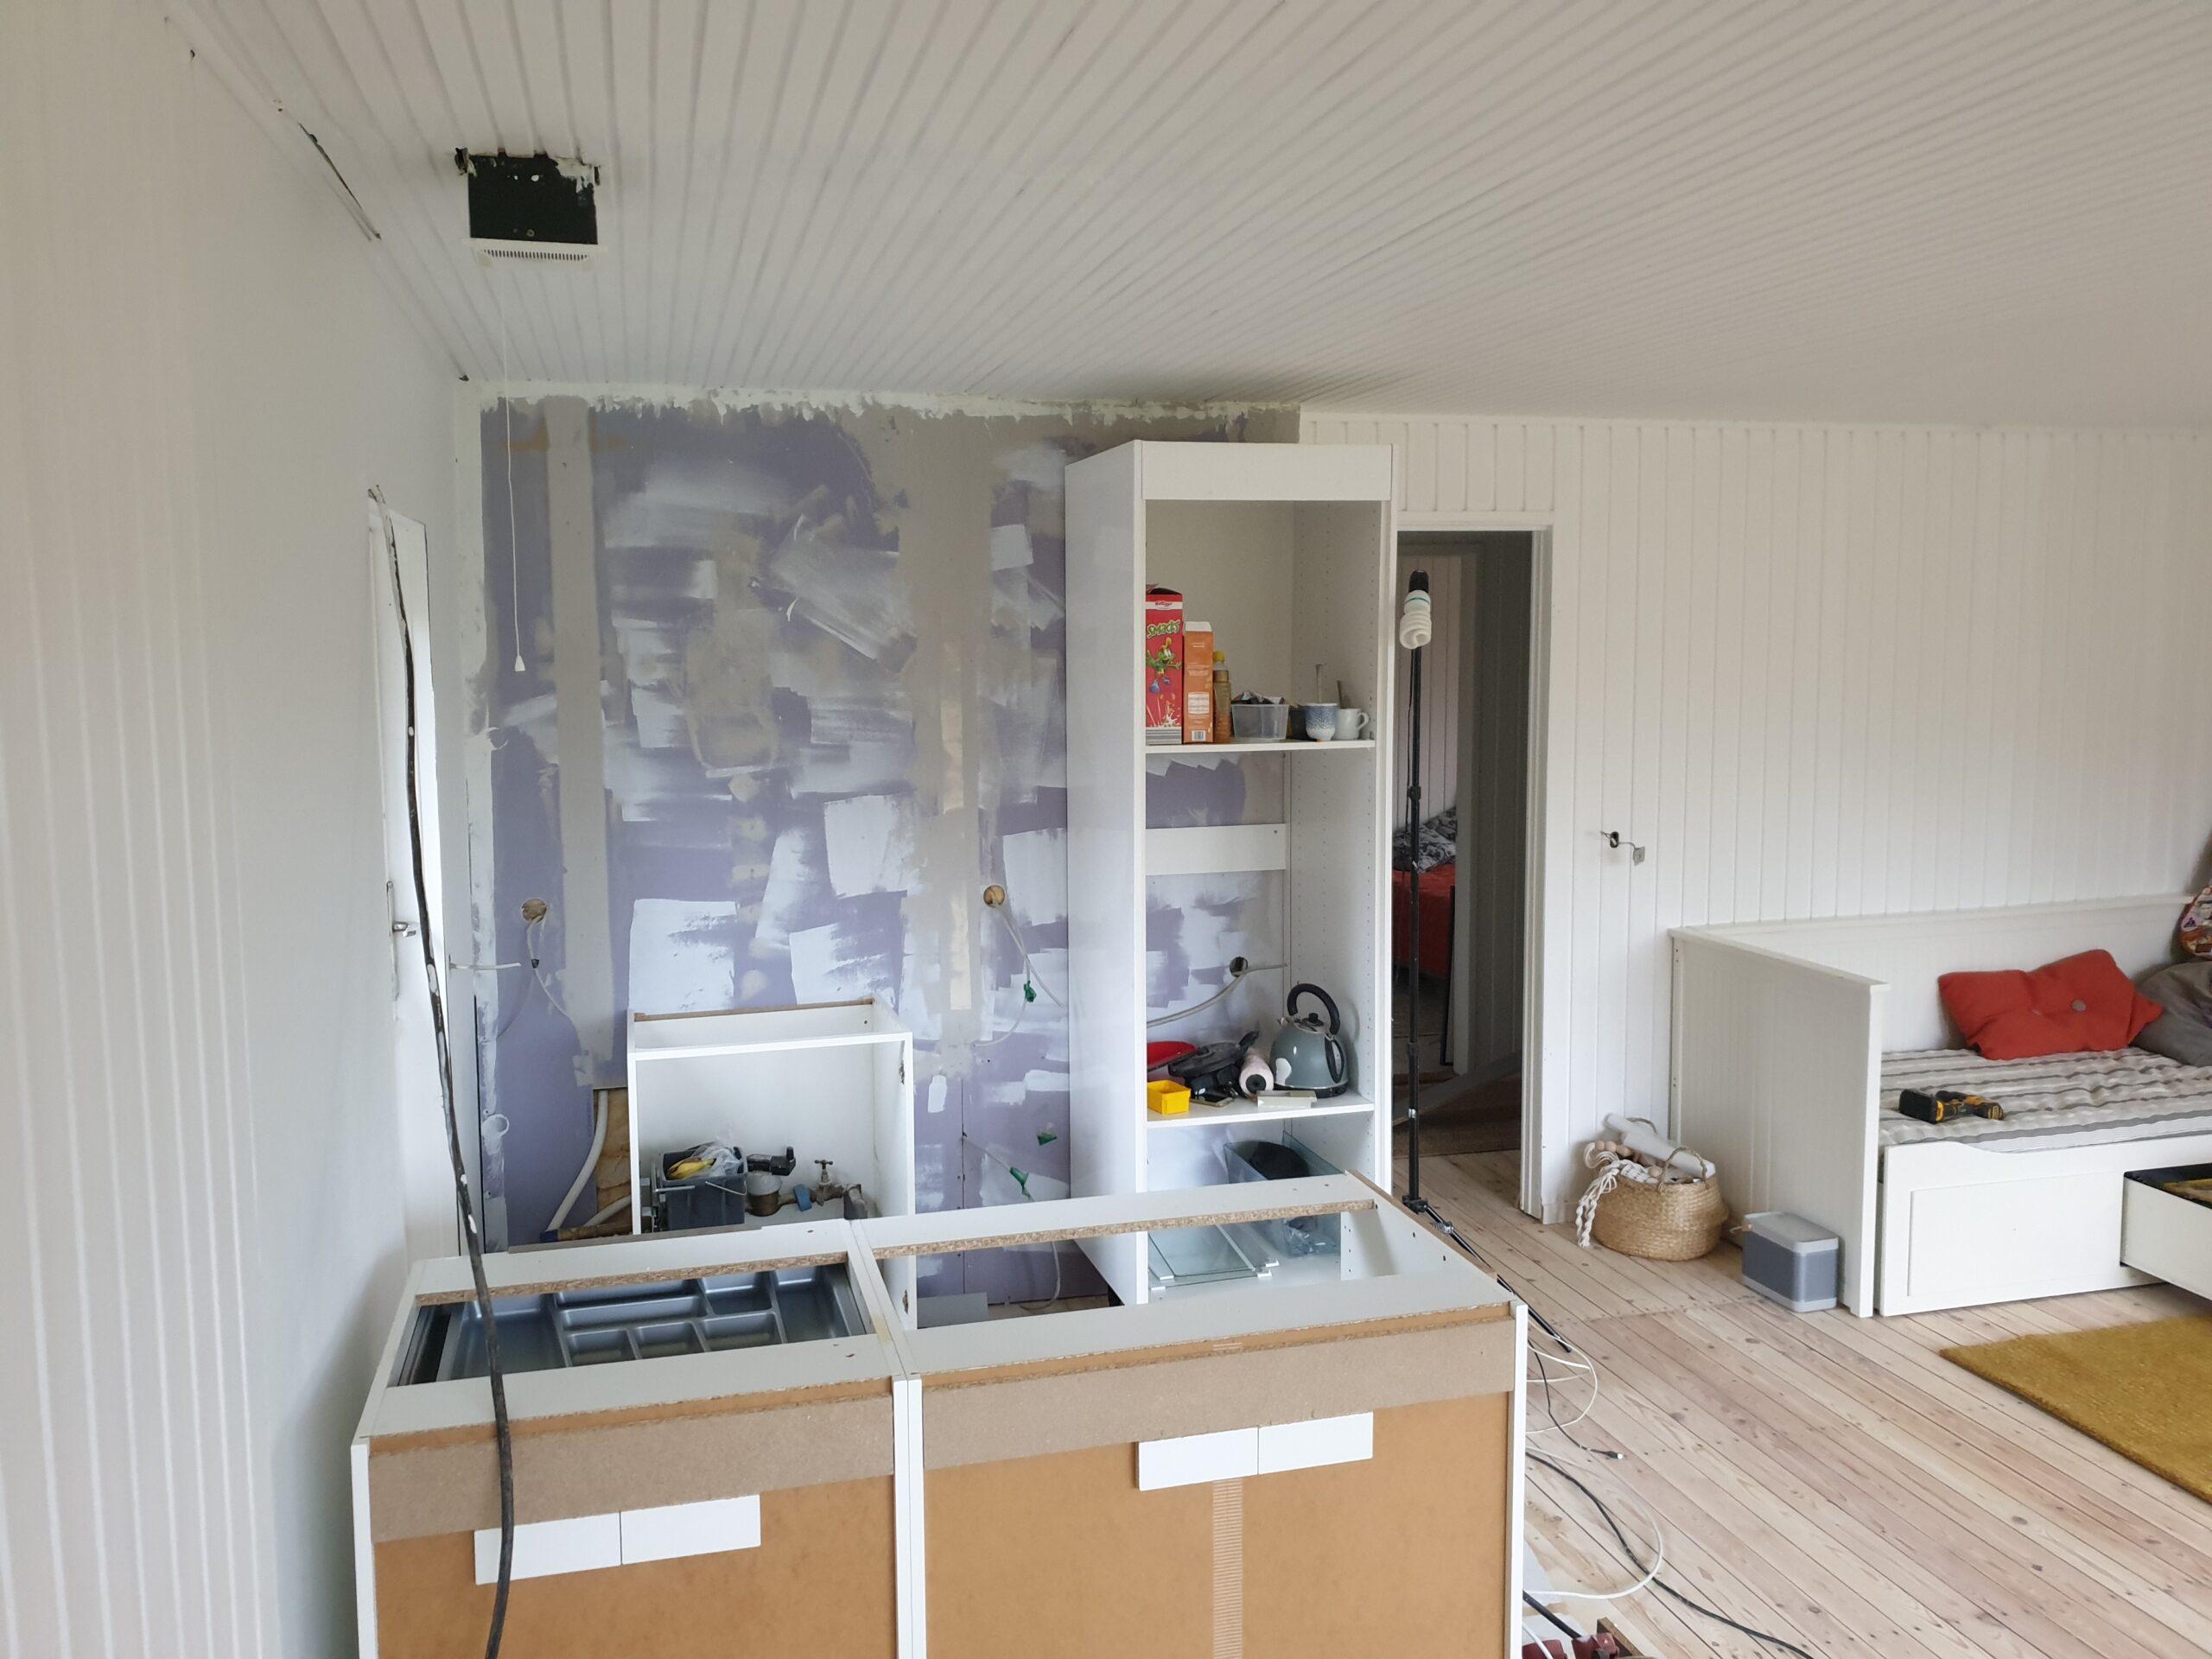 Kokken Renovering Trin For Trin Life Of Lars